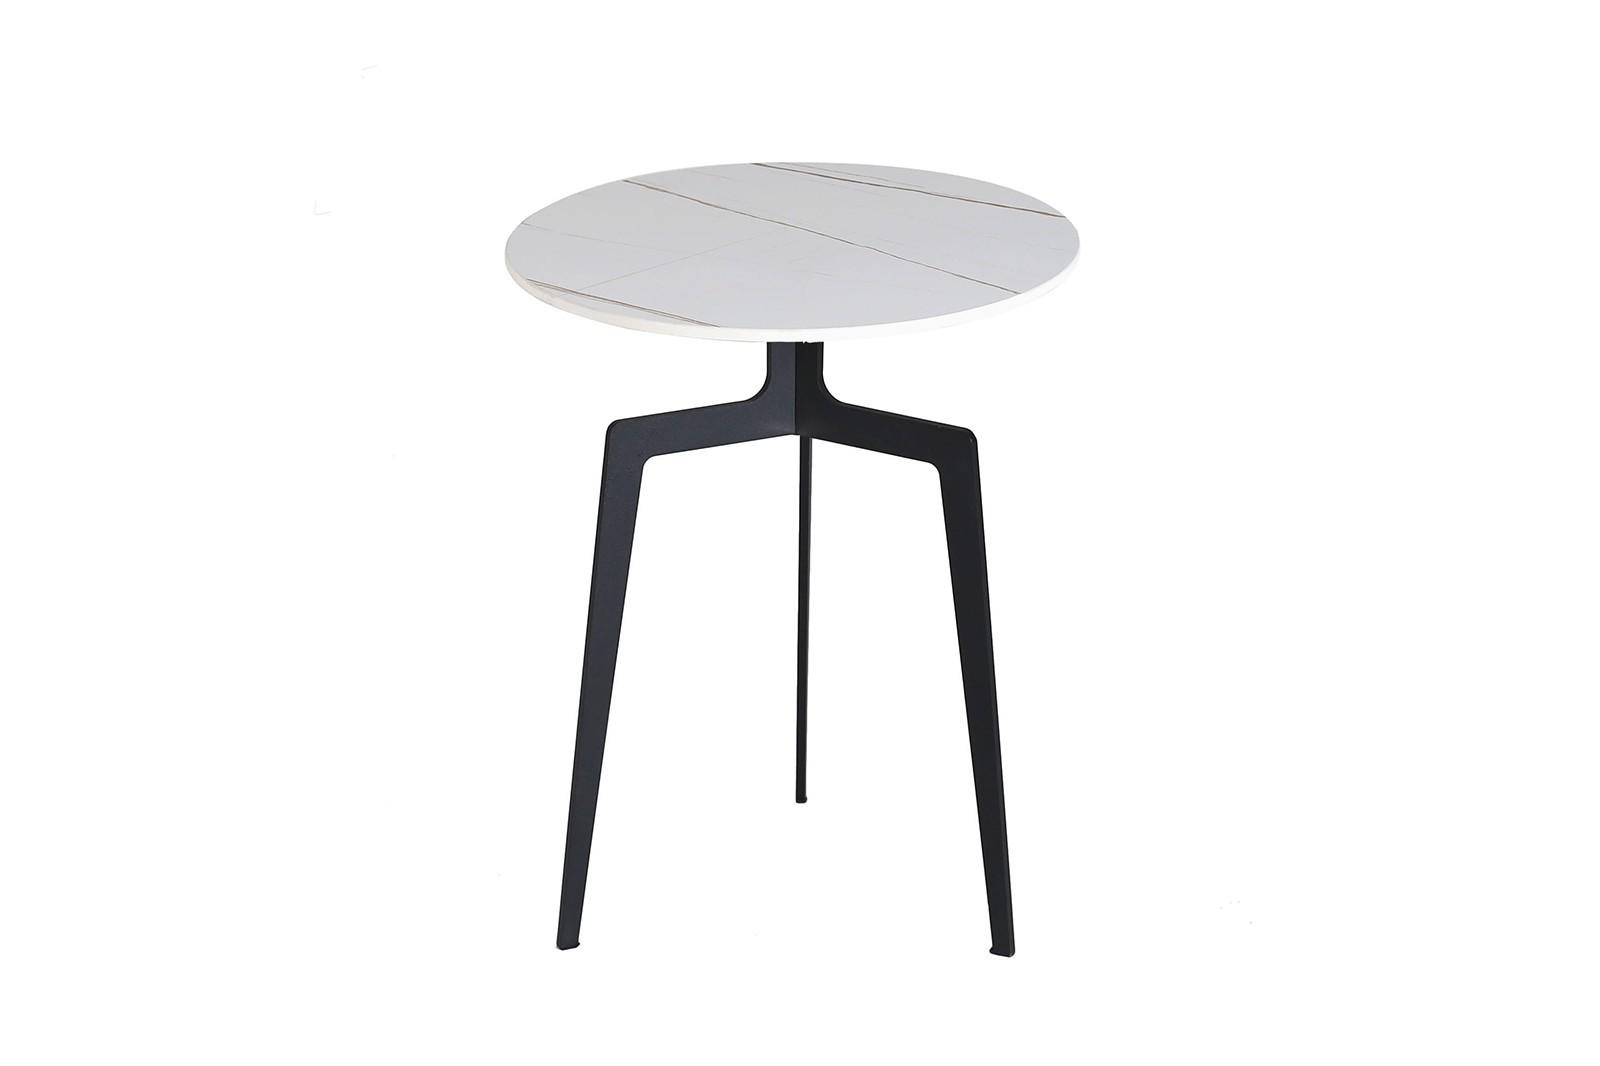 SIDE TABLE N.02 METAL STONE WHITE